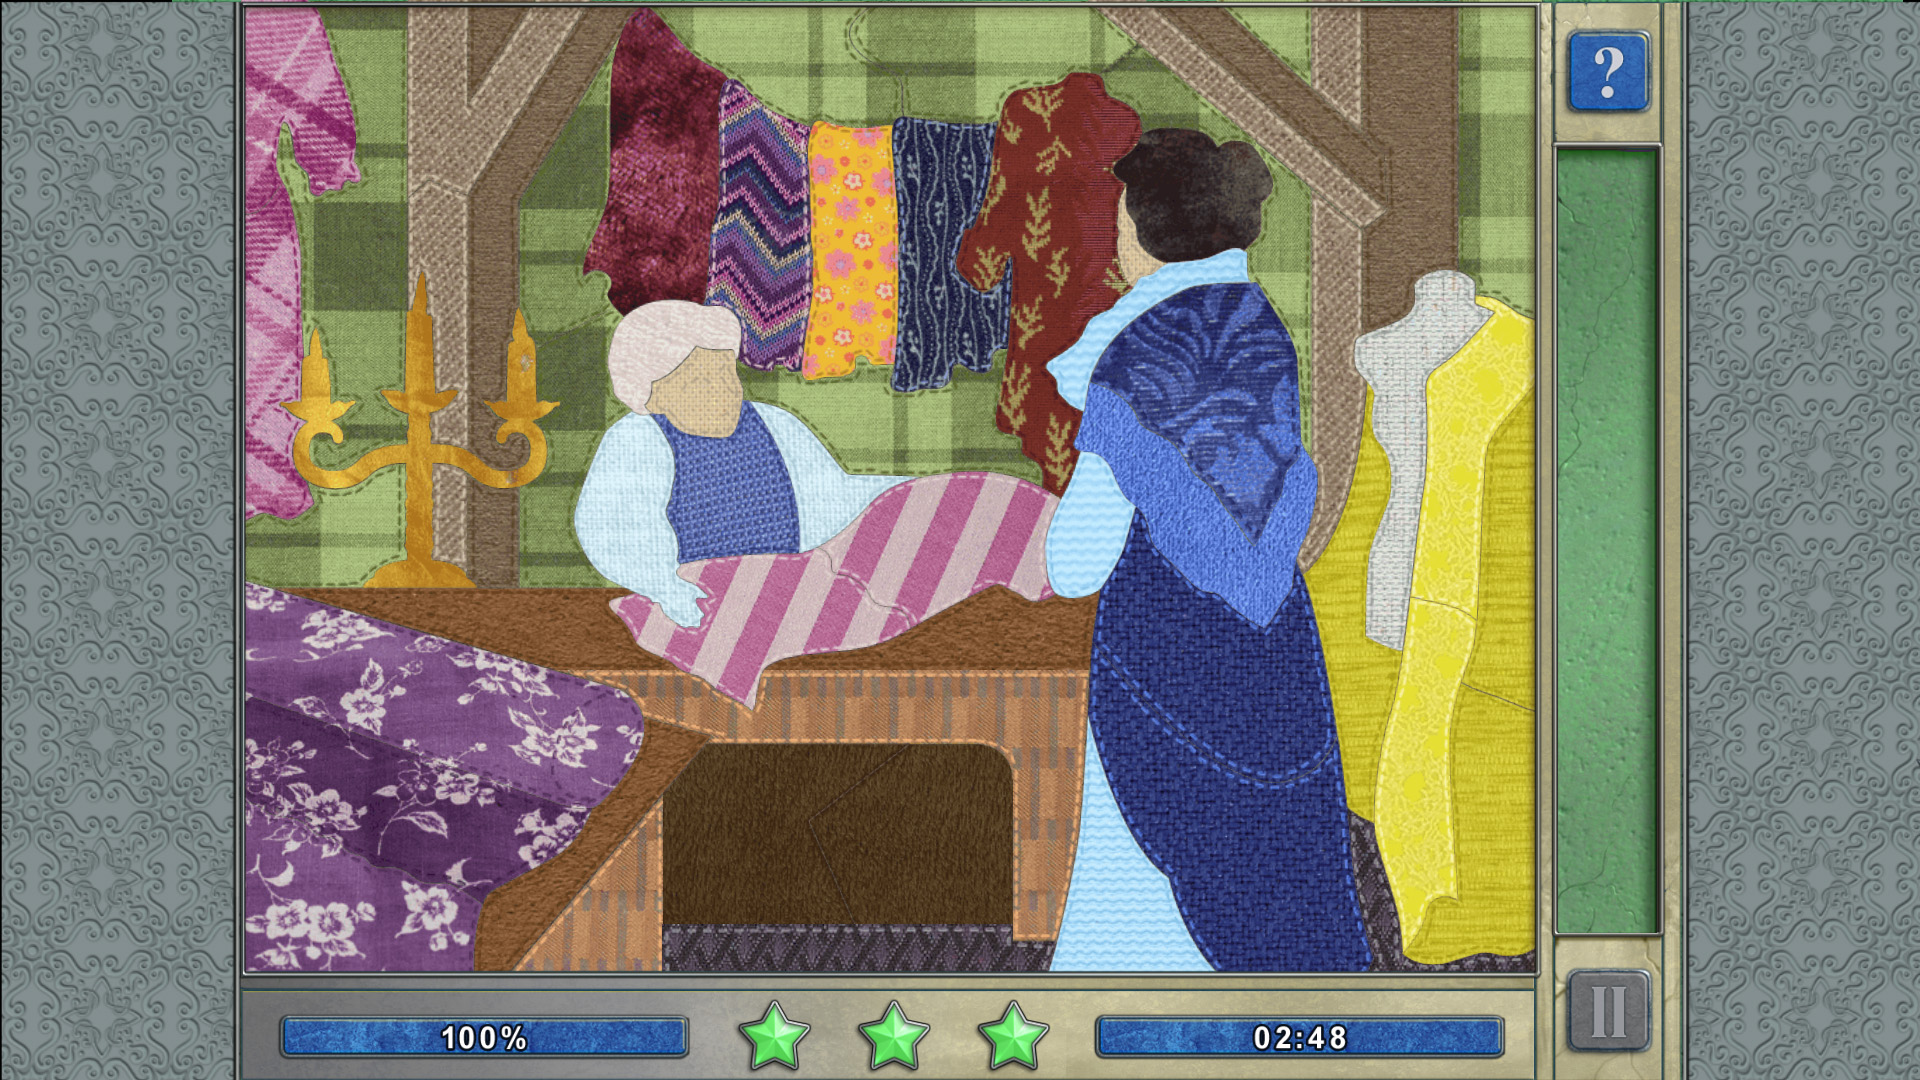 Mosaic: Game of Gods screenshot